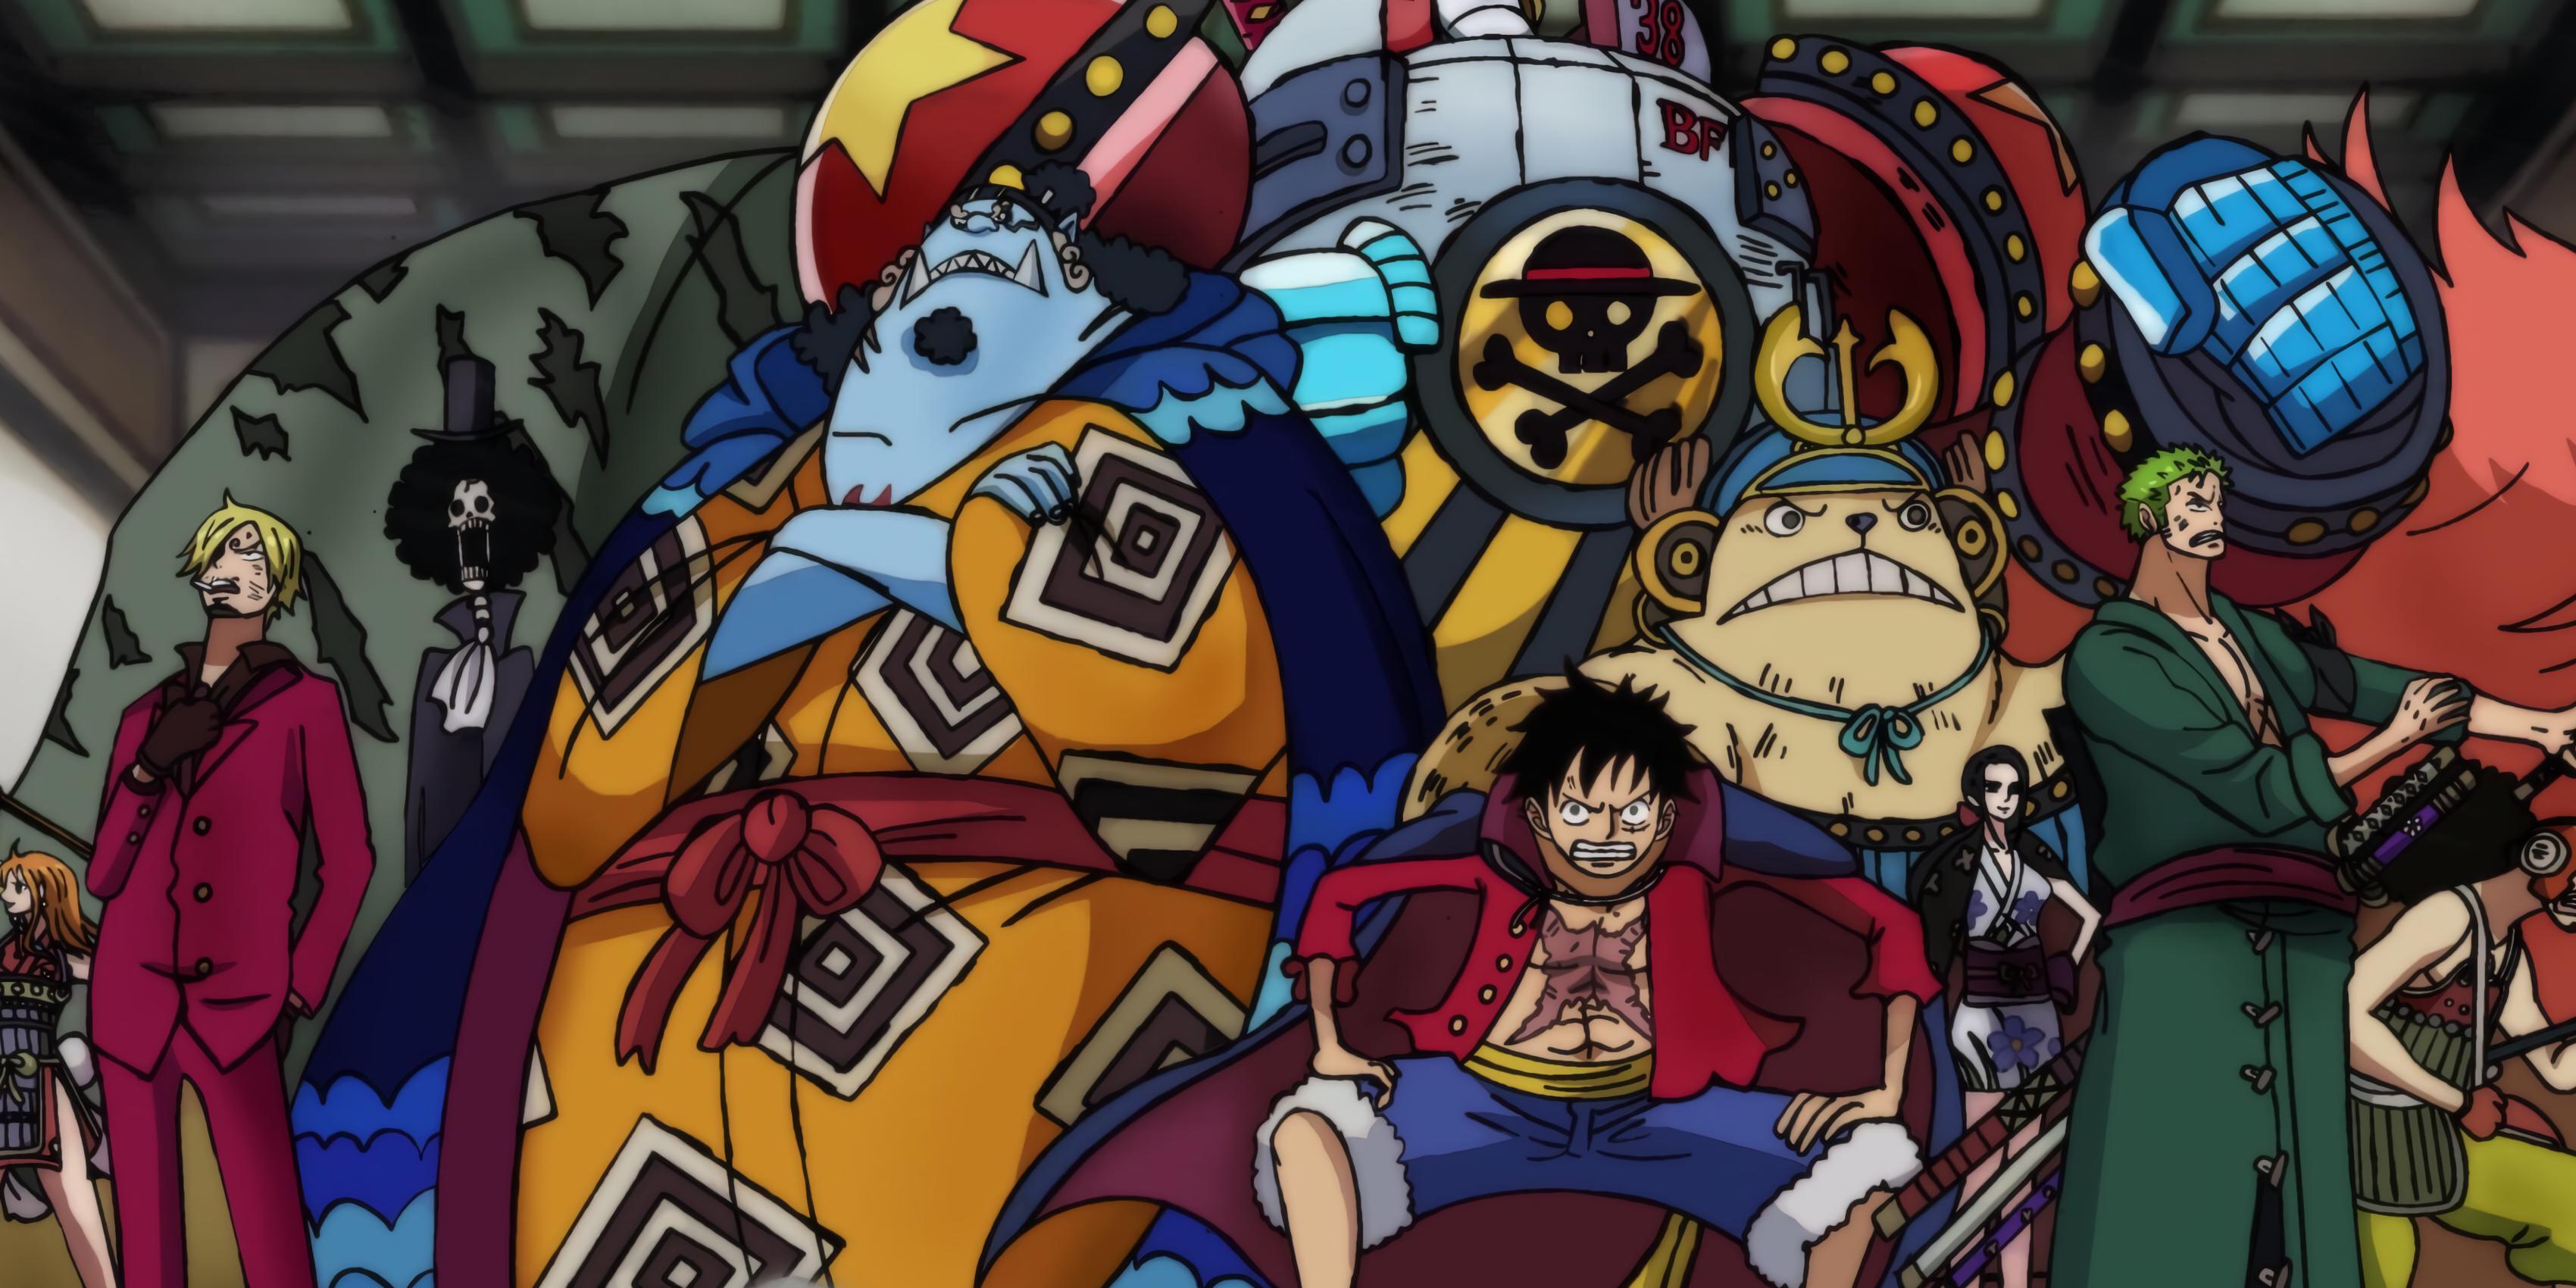 One Piece, Vol. 92 | Book by Eiichiro Oda | Official